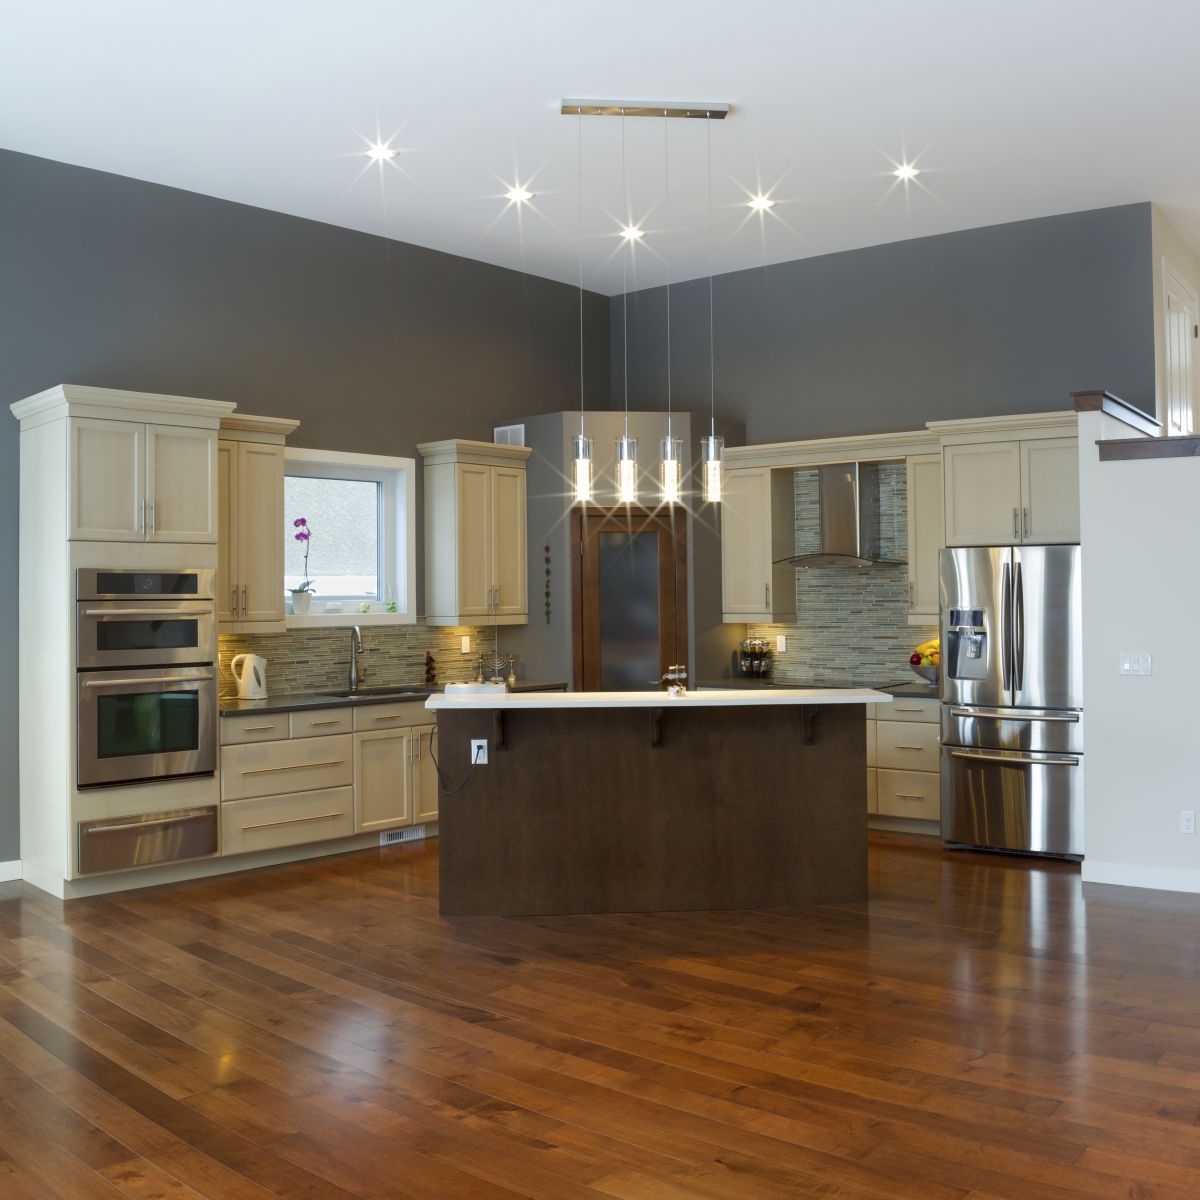 DIY Cabinet Refacing: Beautiful Budget Kitchen Remodeling